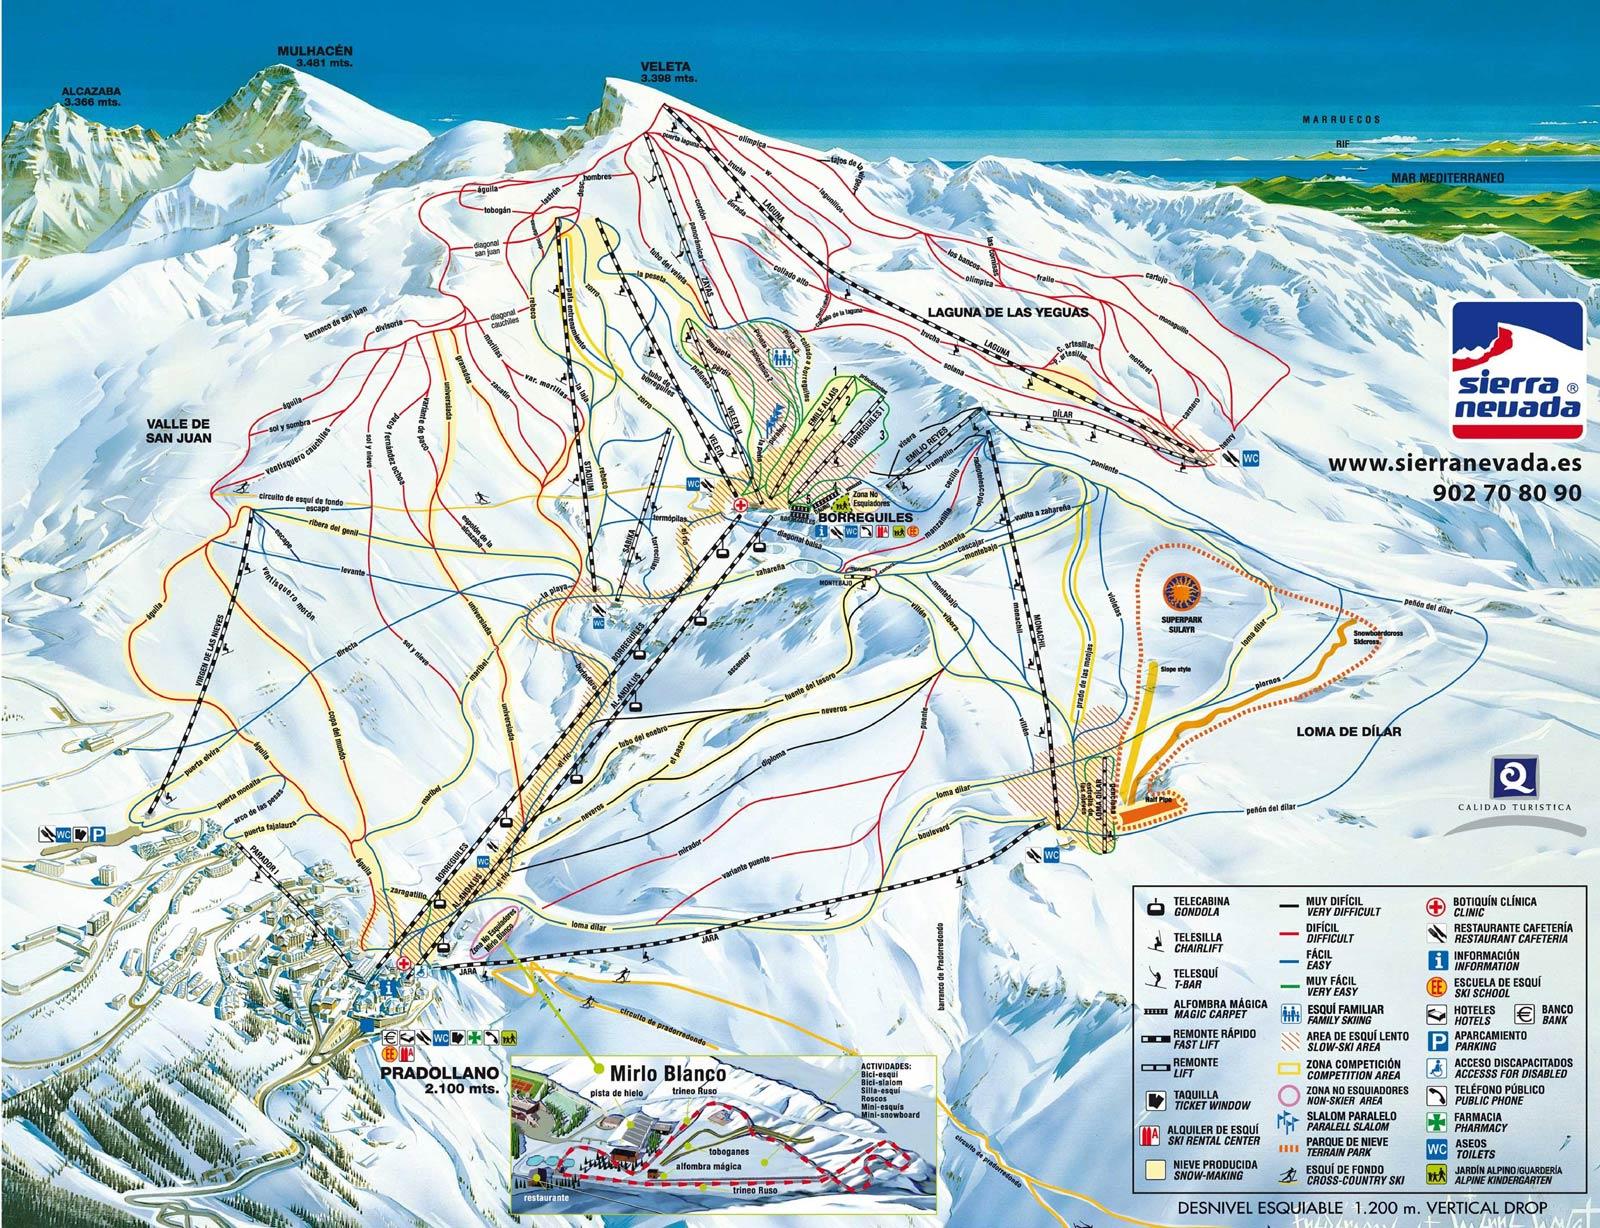 Sierra Nevada Mapa pistas